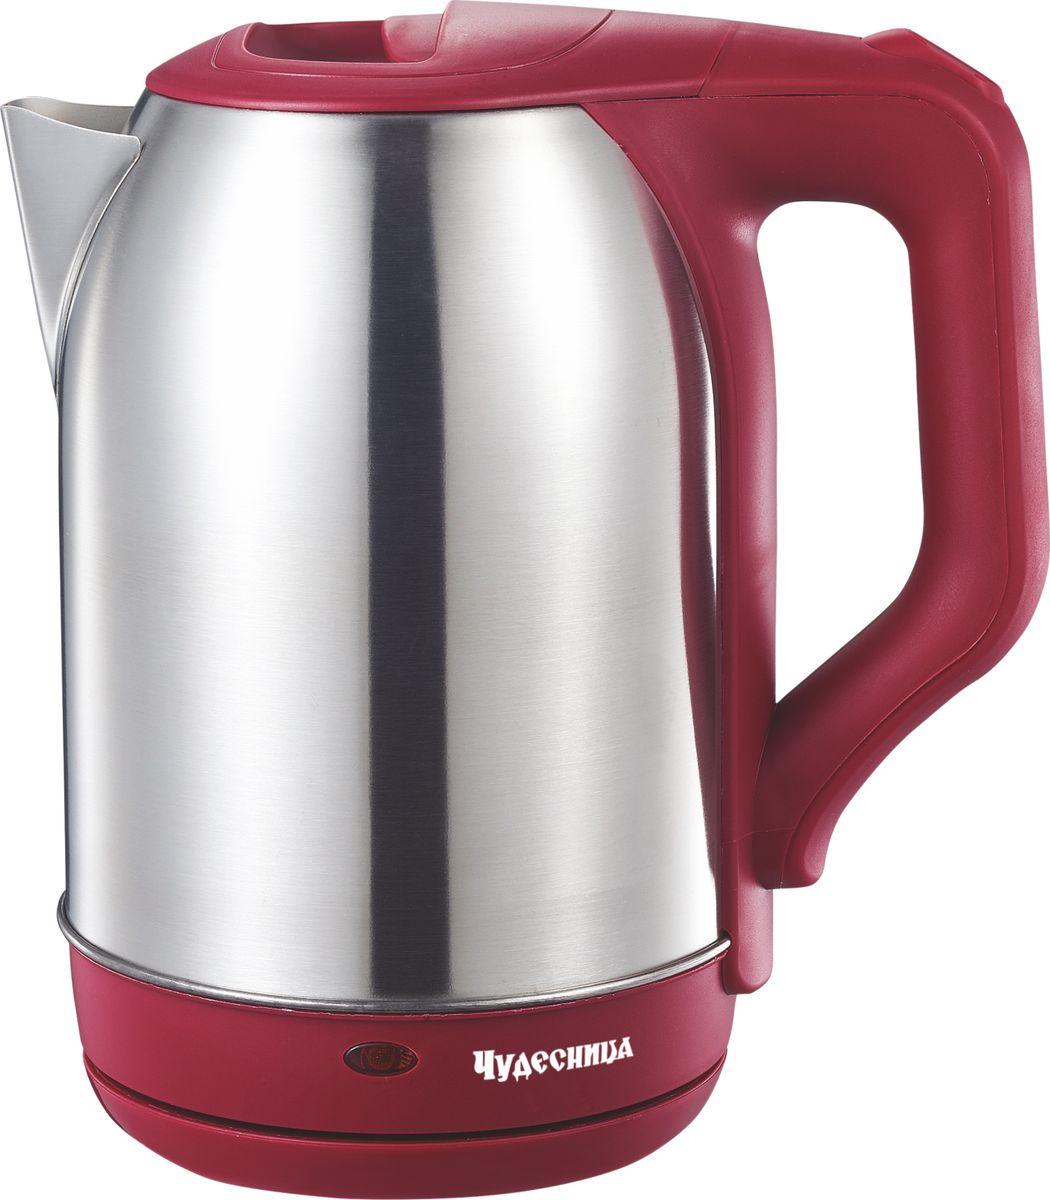 Чудесница ЭЧ-2023, Red чайник электрический цена и фото